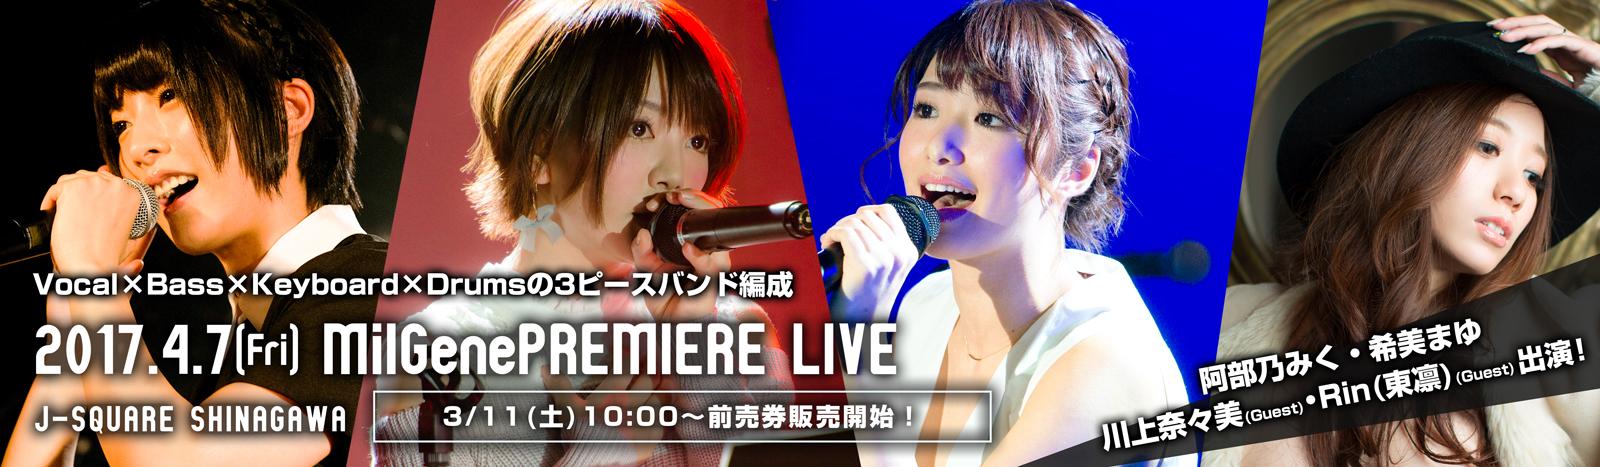 MilGene Premium Live(ミルジェネプレミアムライブ)